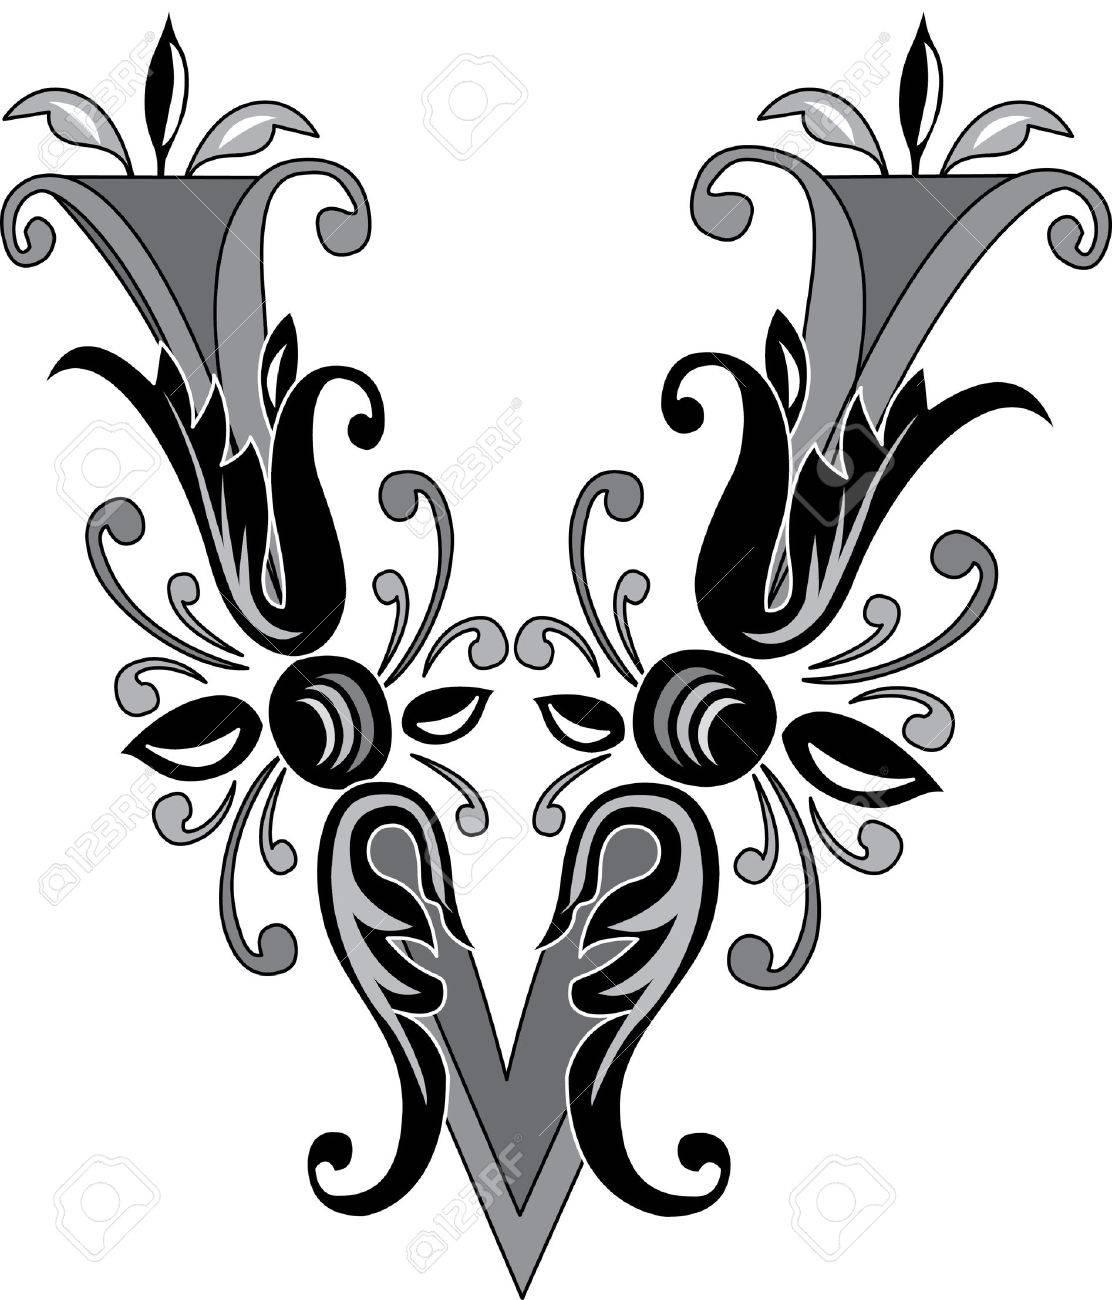 Foliage English Alphabet Letter V Black And White Royalty Free